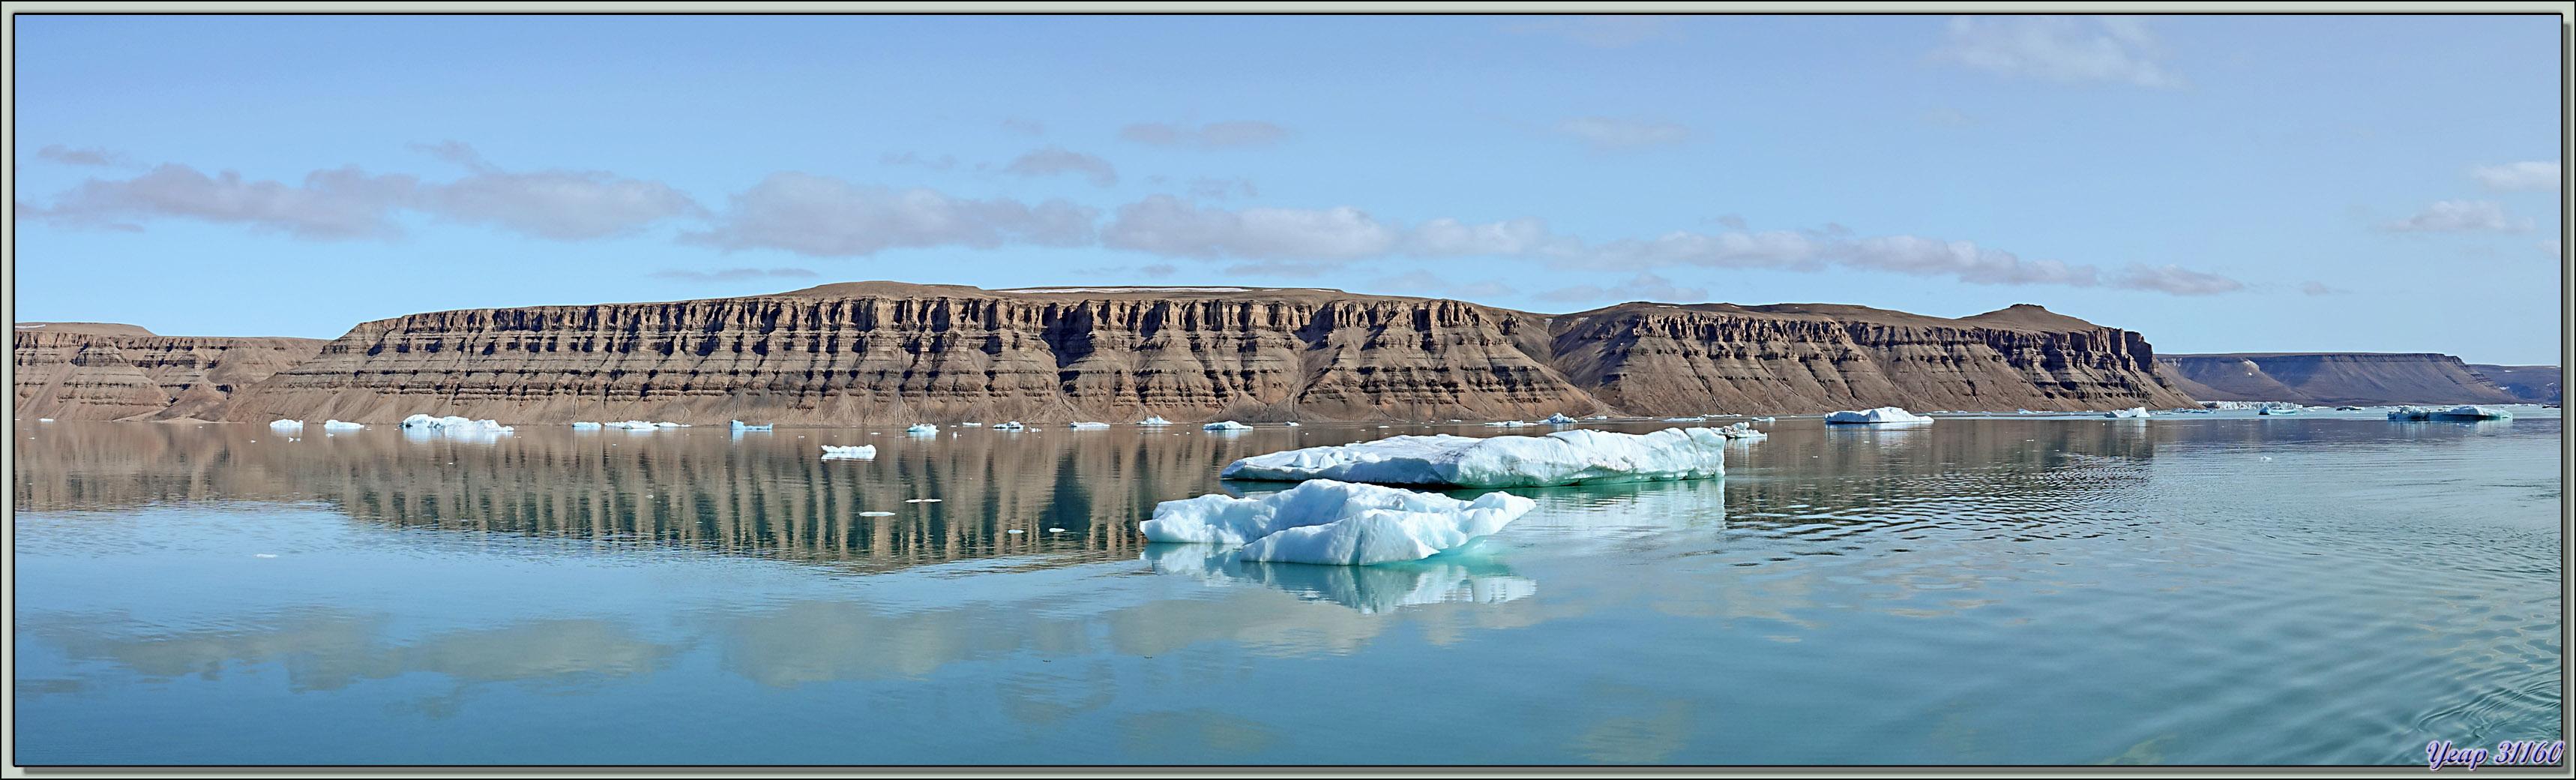 Navigation dans Croker Bay en direction de Dundas Harbour - Devon Island - Nunavut - Canada